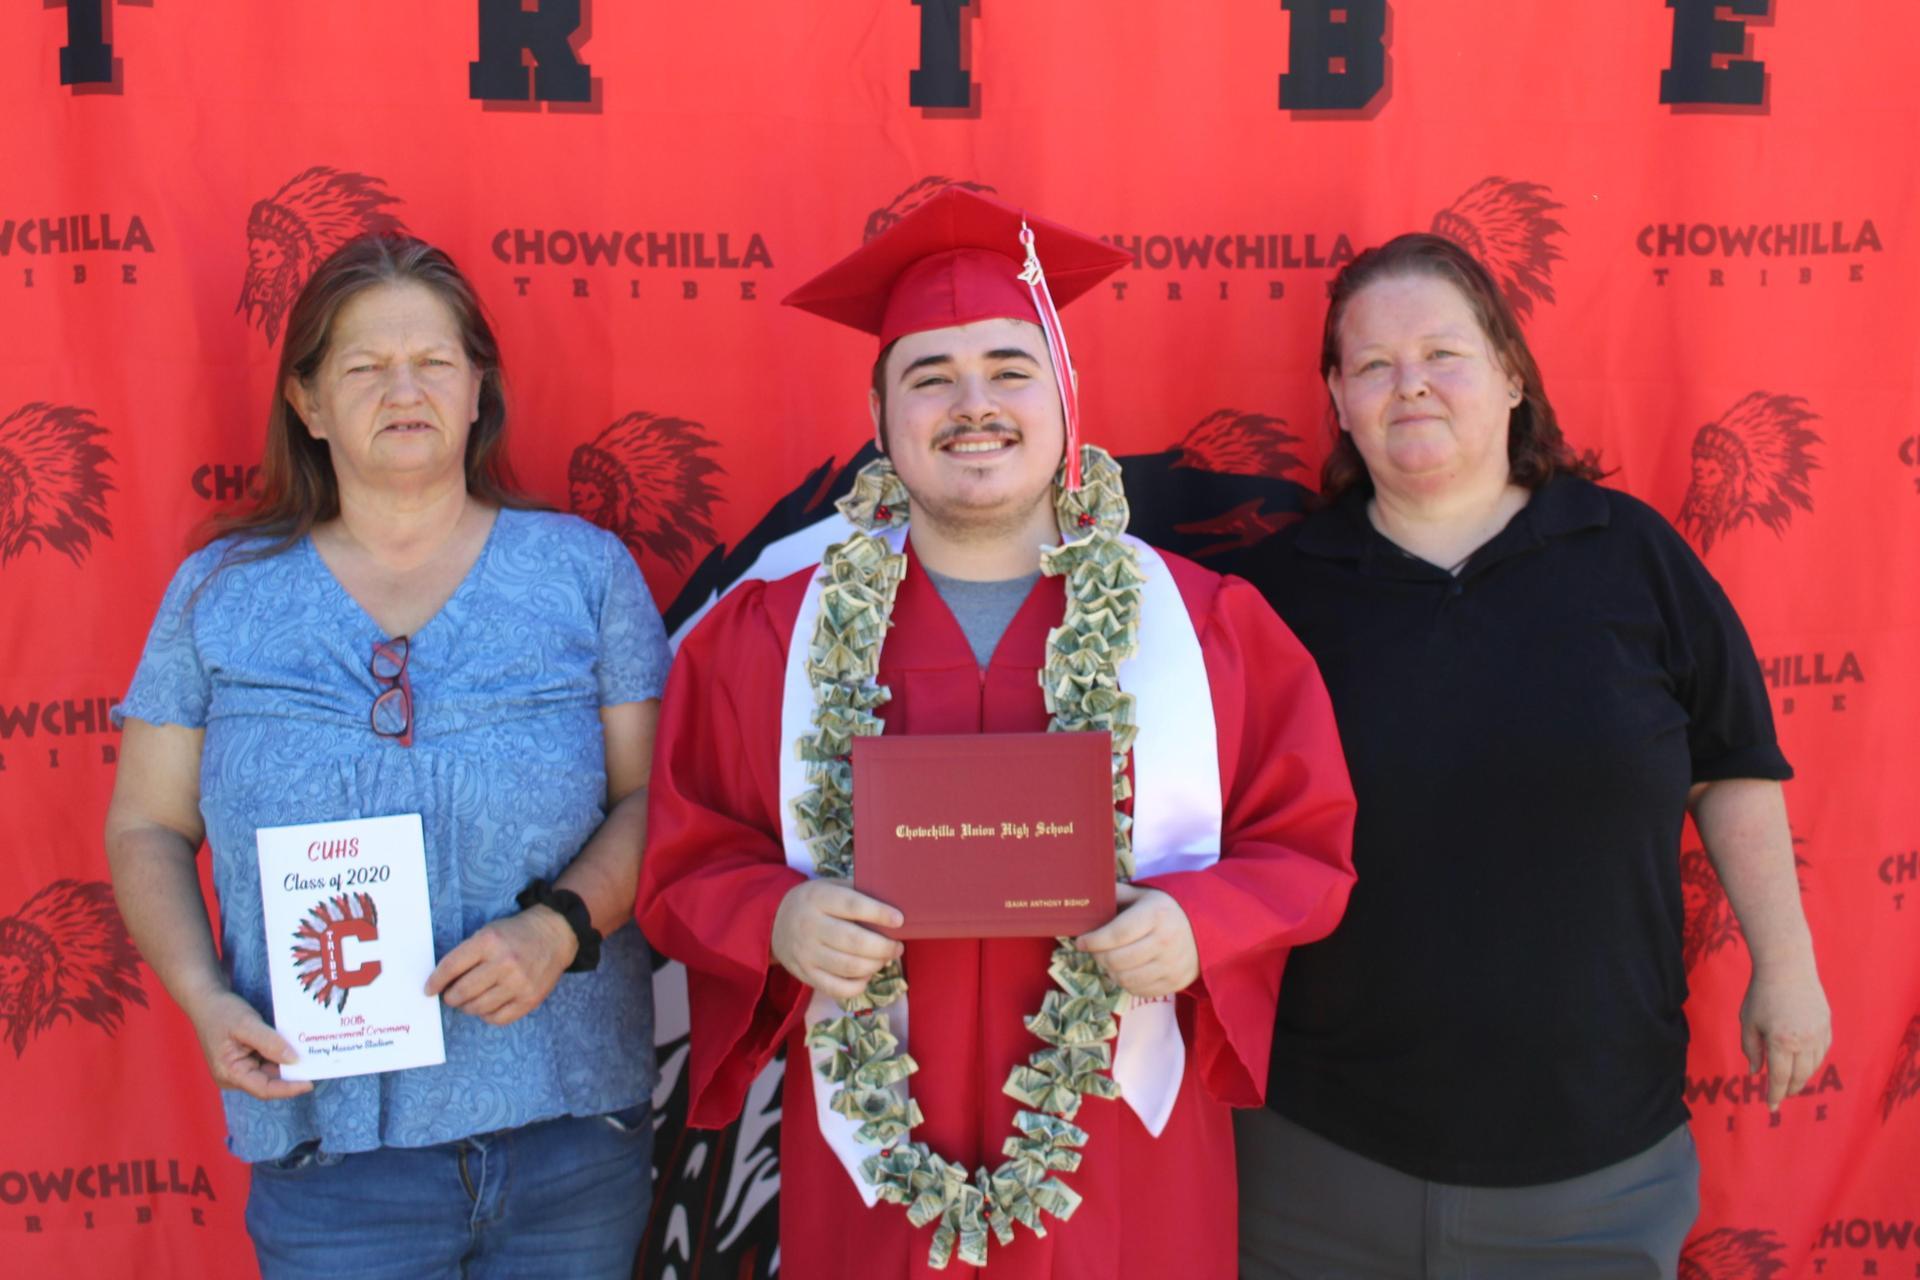 Isaiah Bishop and family